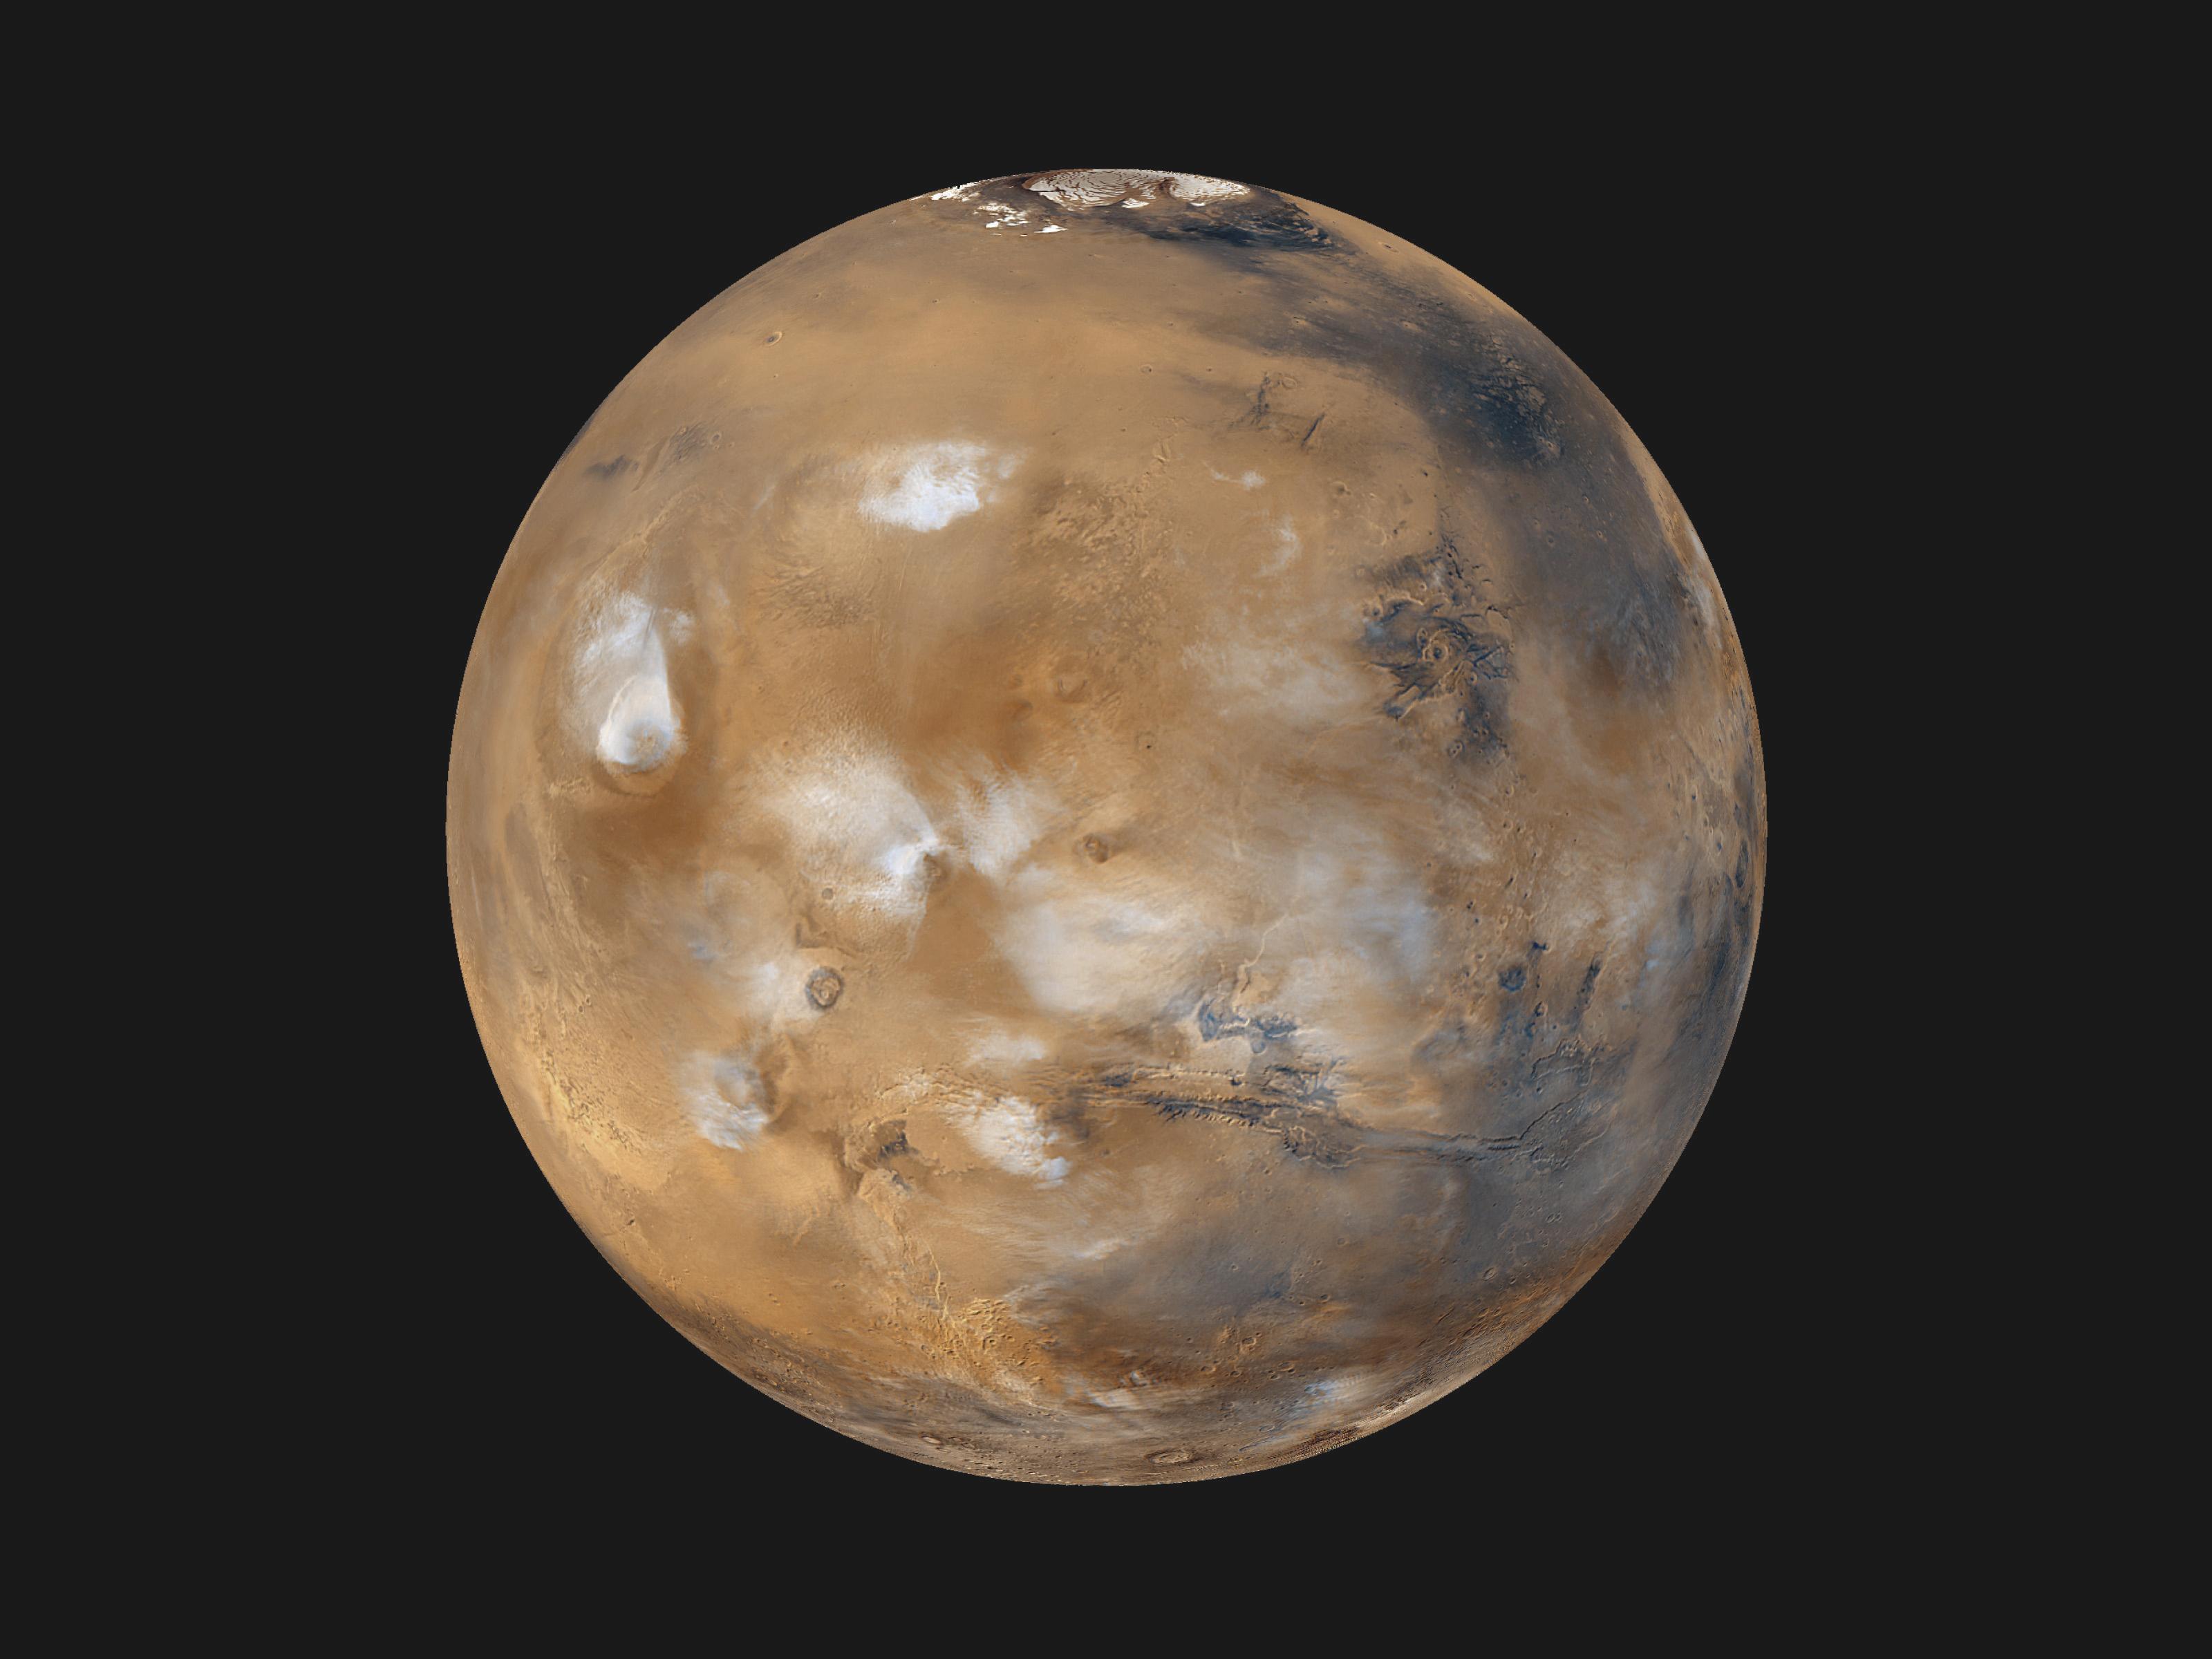 The Coolest Destination for Exchange Students: Mars | Mars News